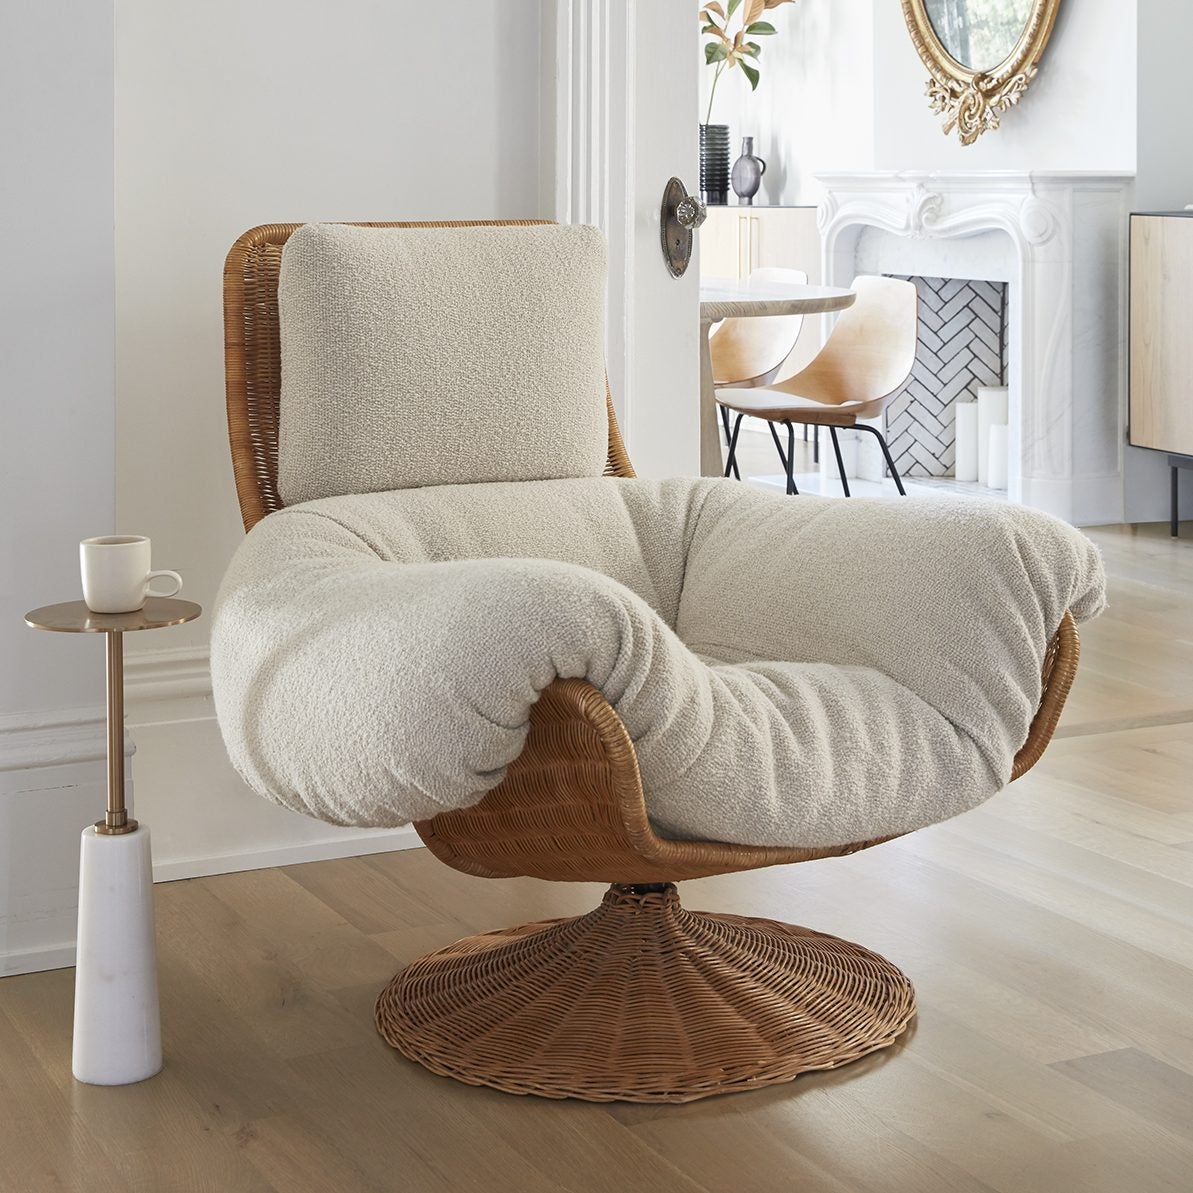 cozy white chair